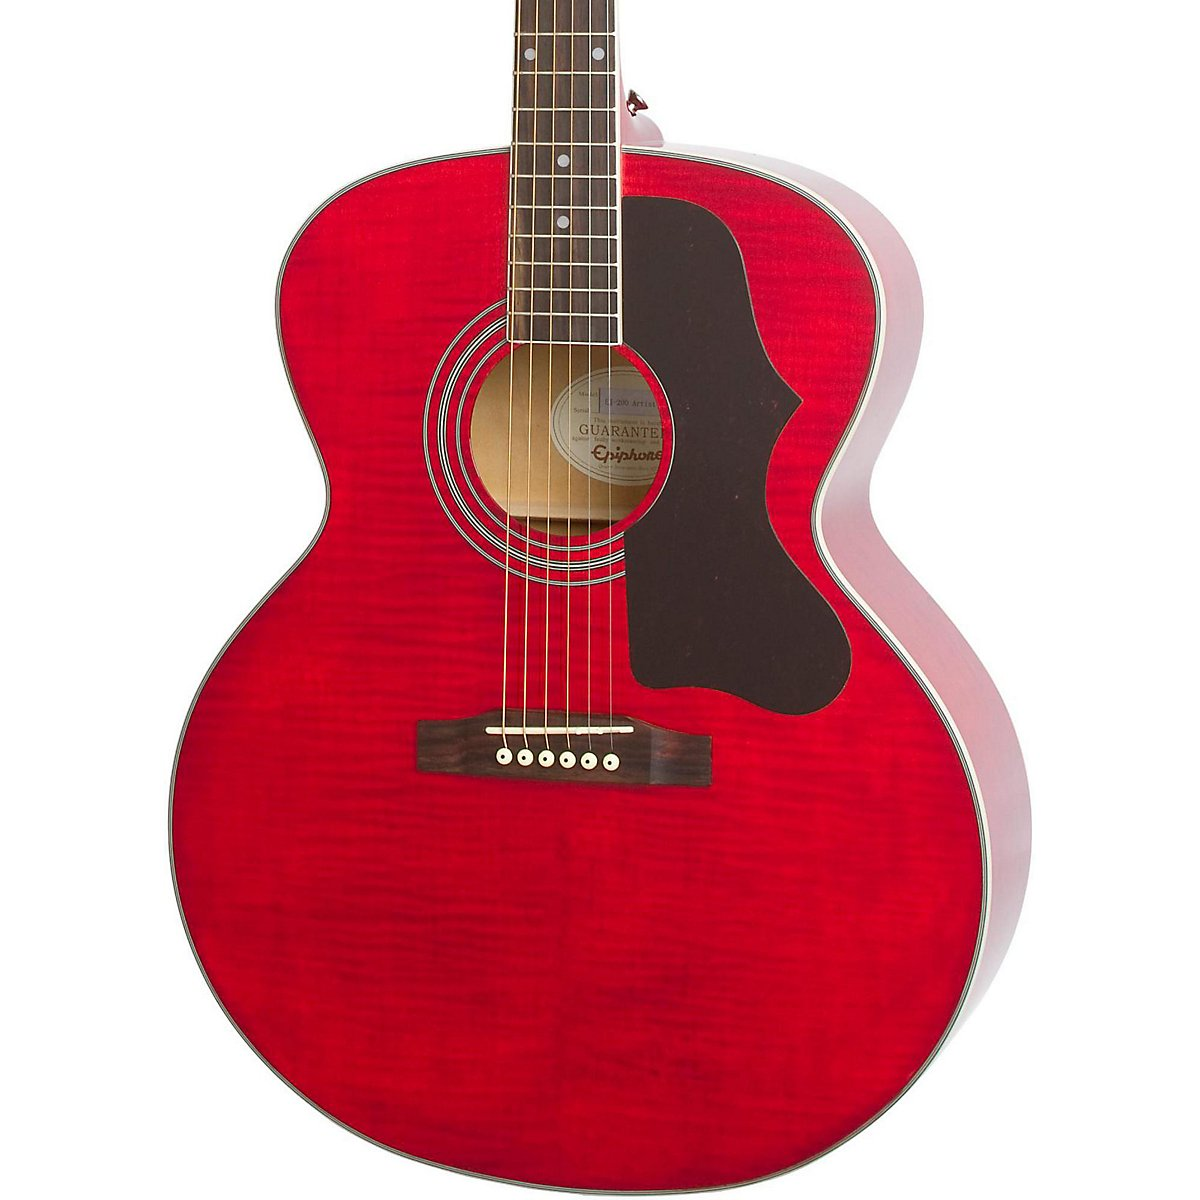 Epiphone EJ-200 Artist WR アコースティックギター (エピフォン) B00N3FSHRW